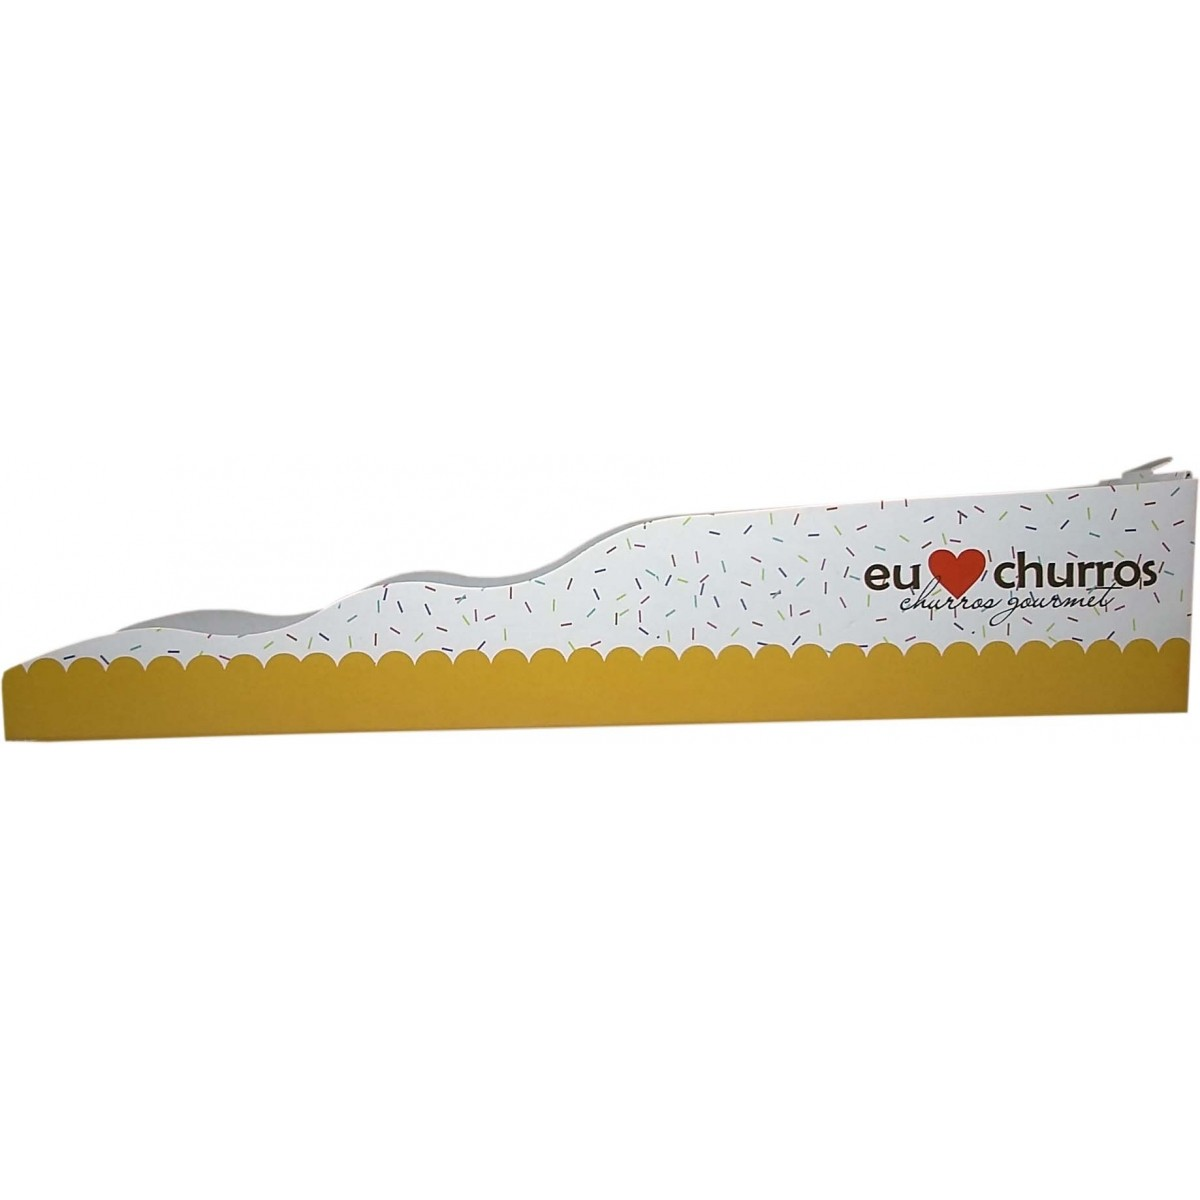 Embalagem para Churros Gourmet Amarela - 1000 unidades